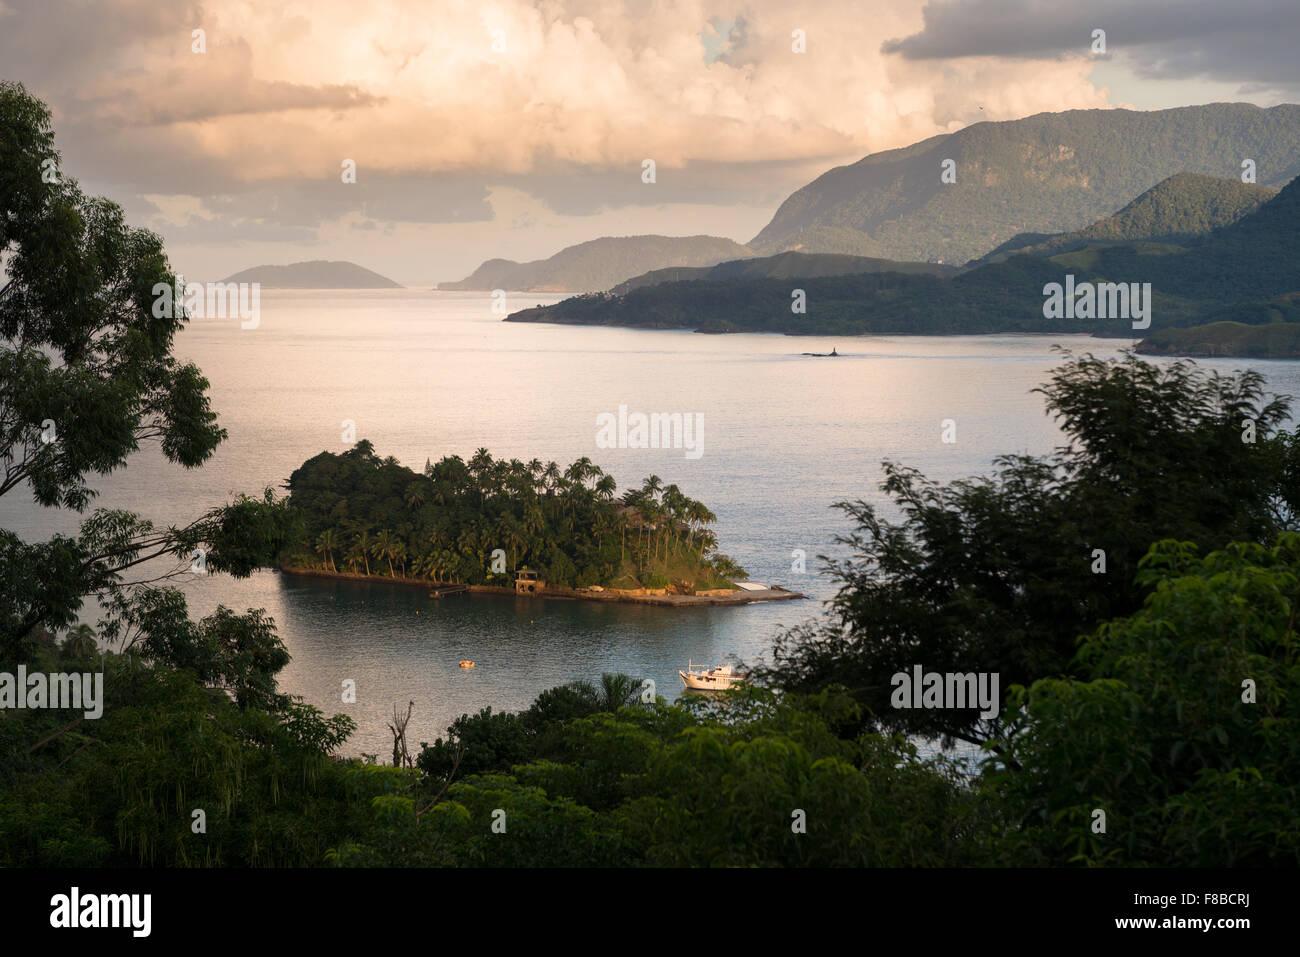 Vista dell'isola Ilha das Cabras, Ilhabela, Brasile Immagini Stock